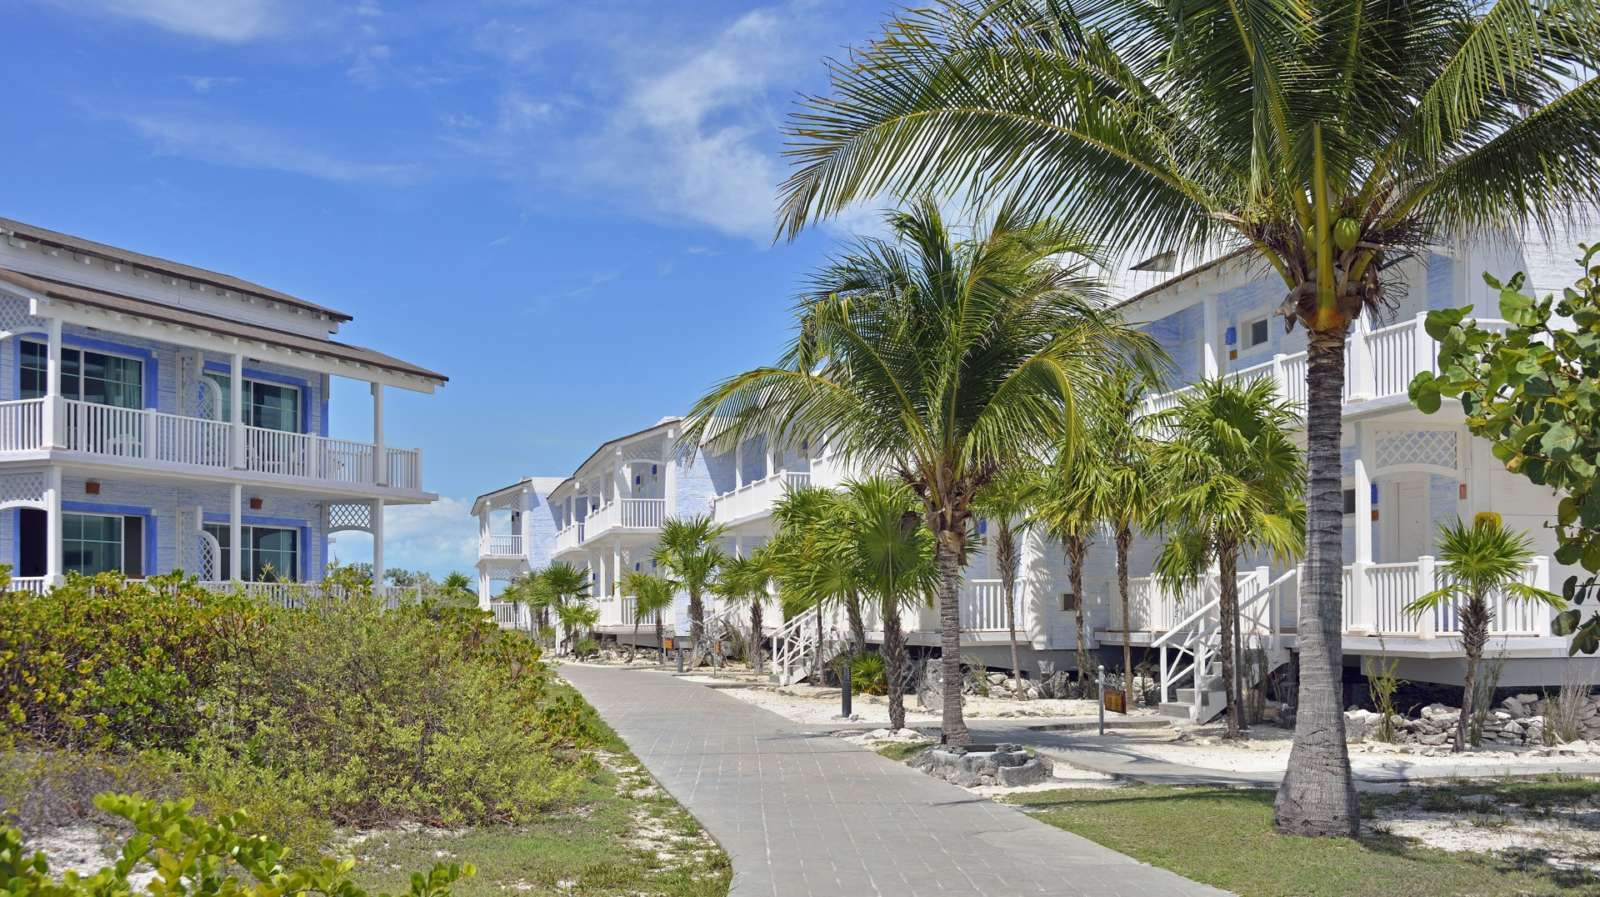 Accommodation block exterior at Sol Cayo Largo